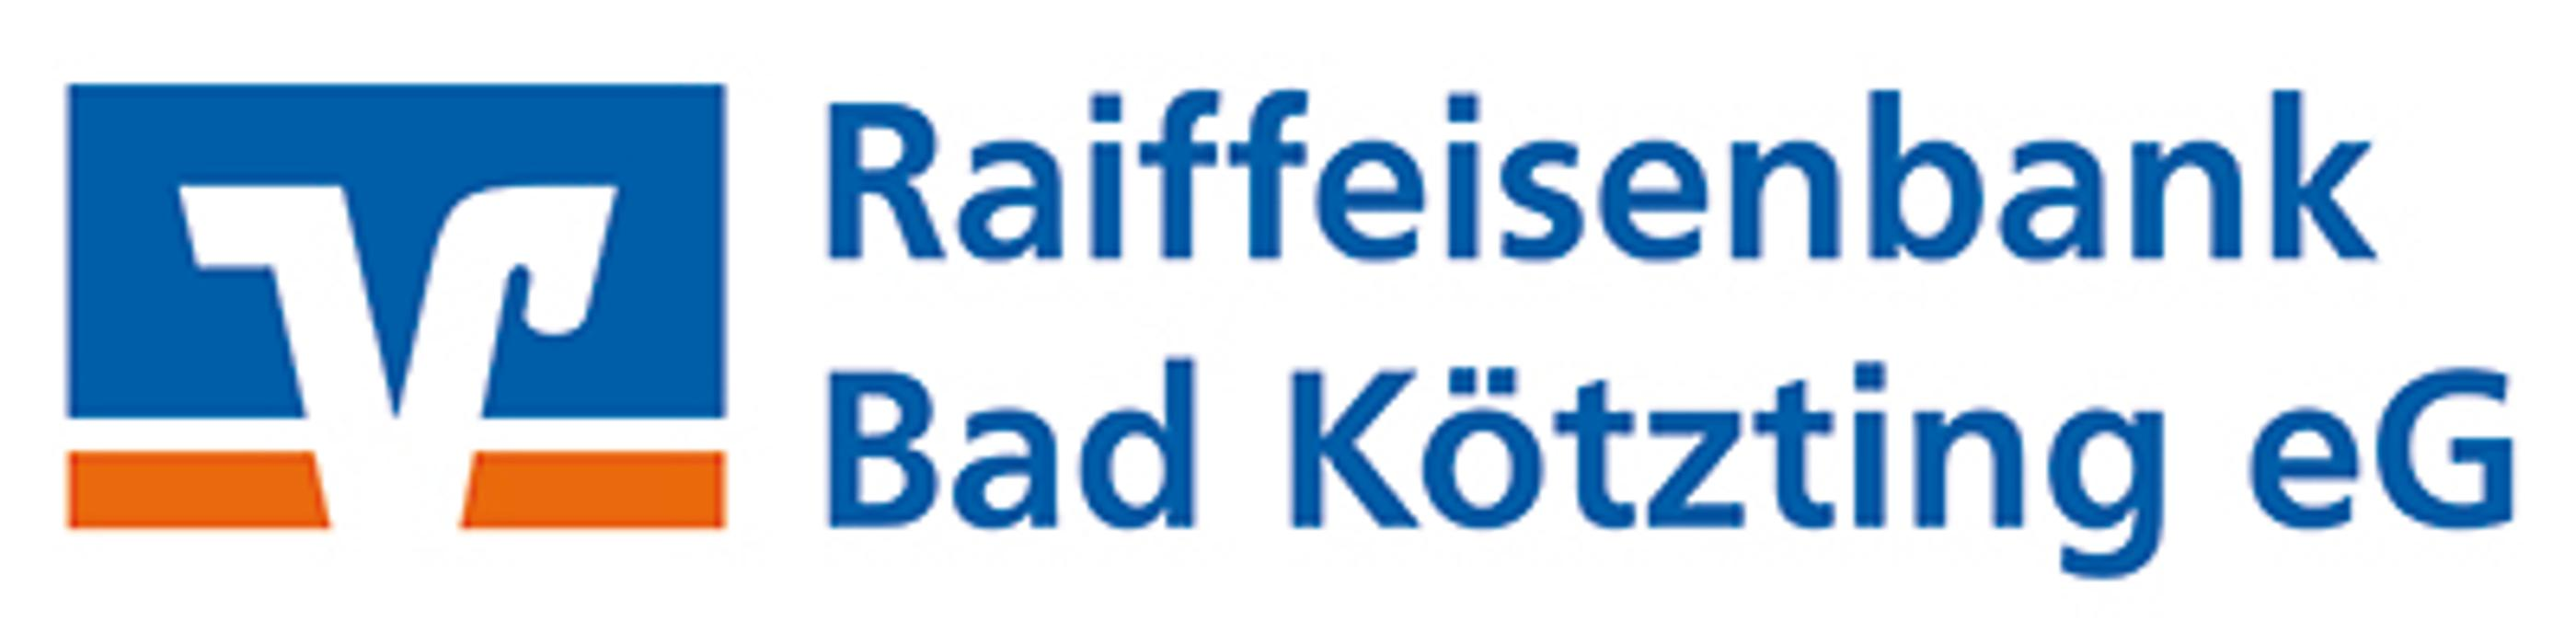 Raiffeisenbank Bad WieГџee